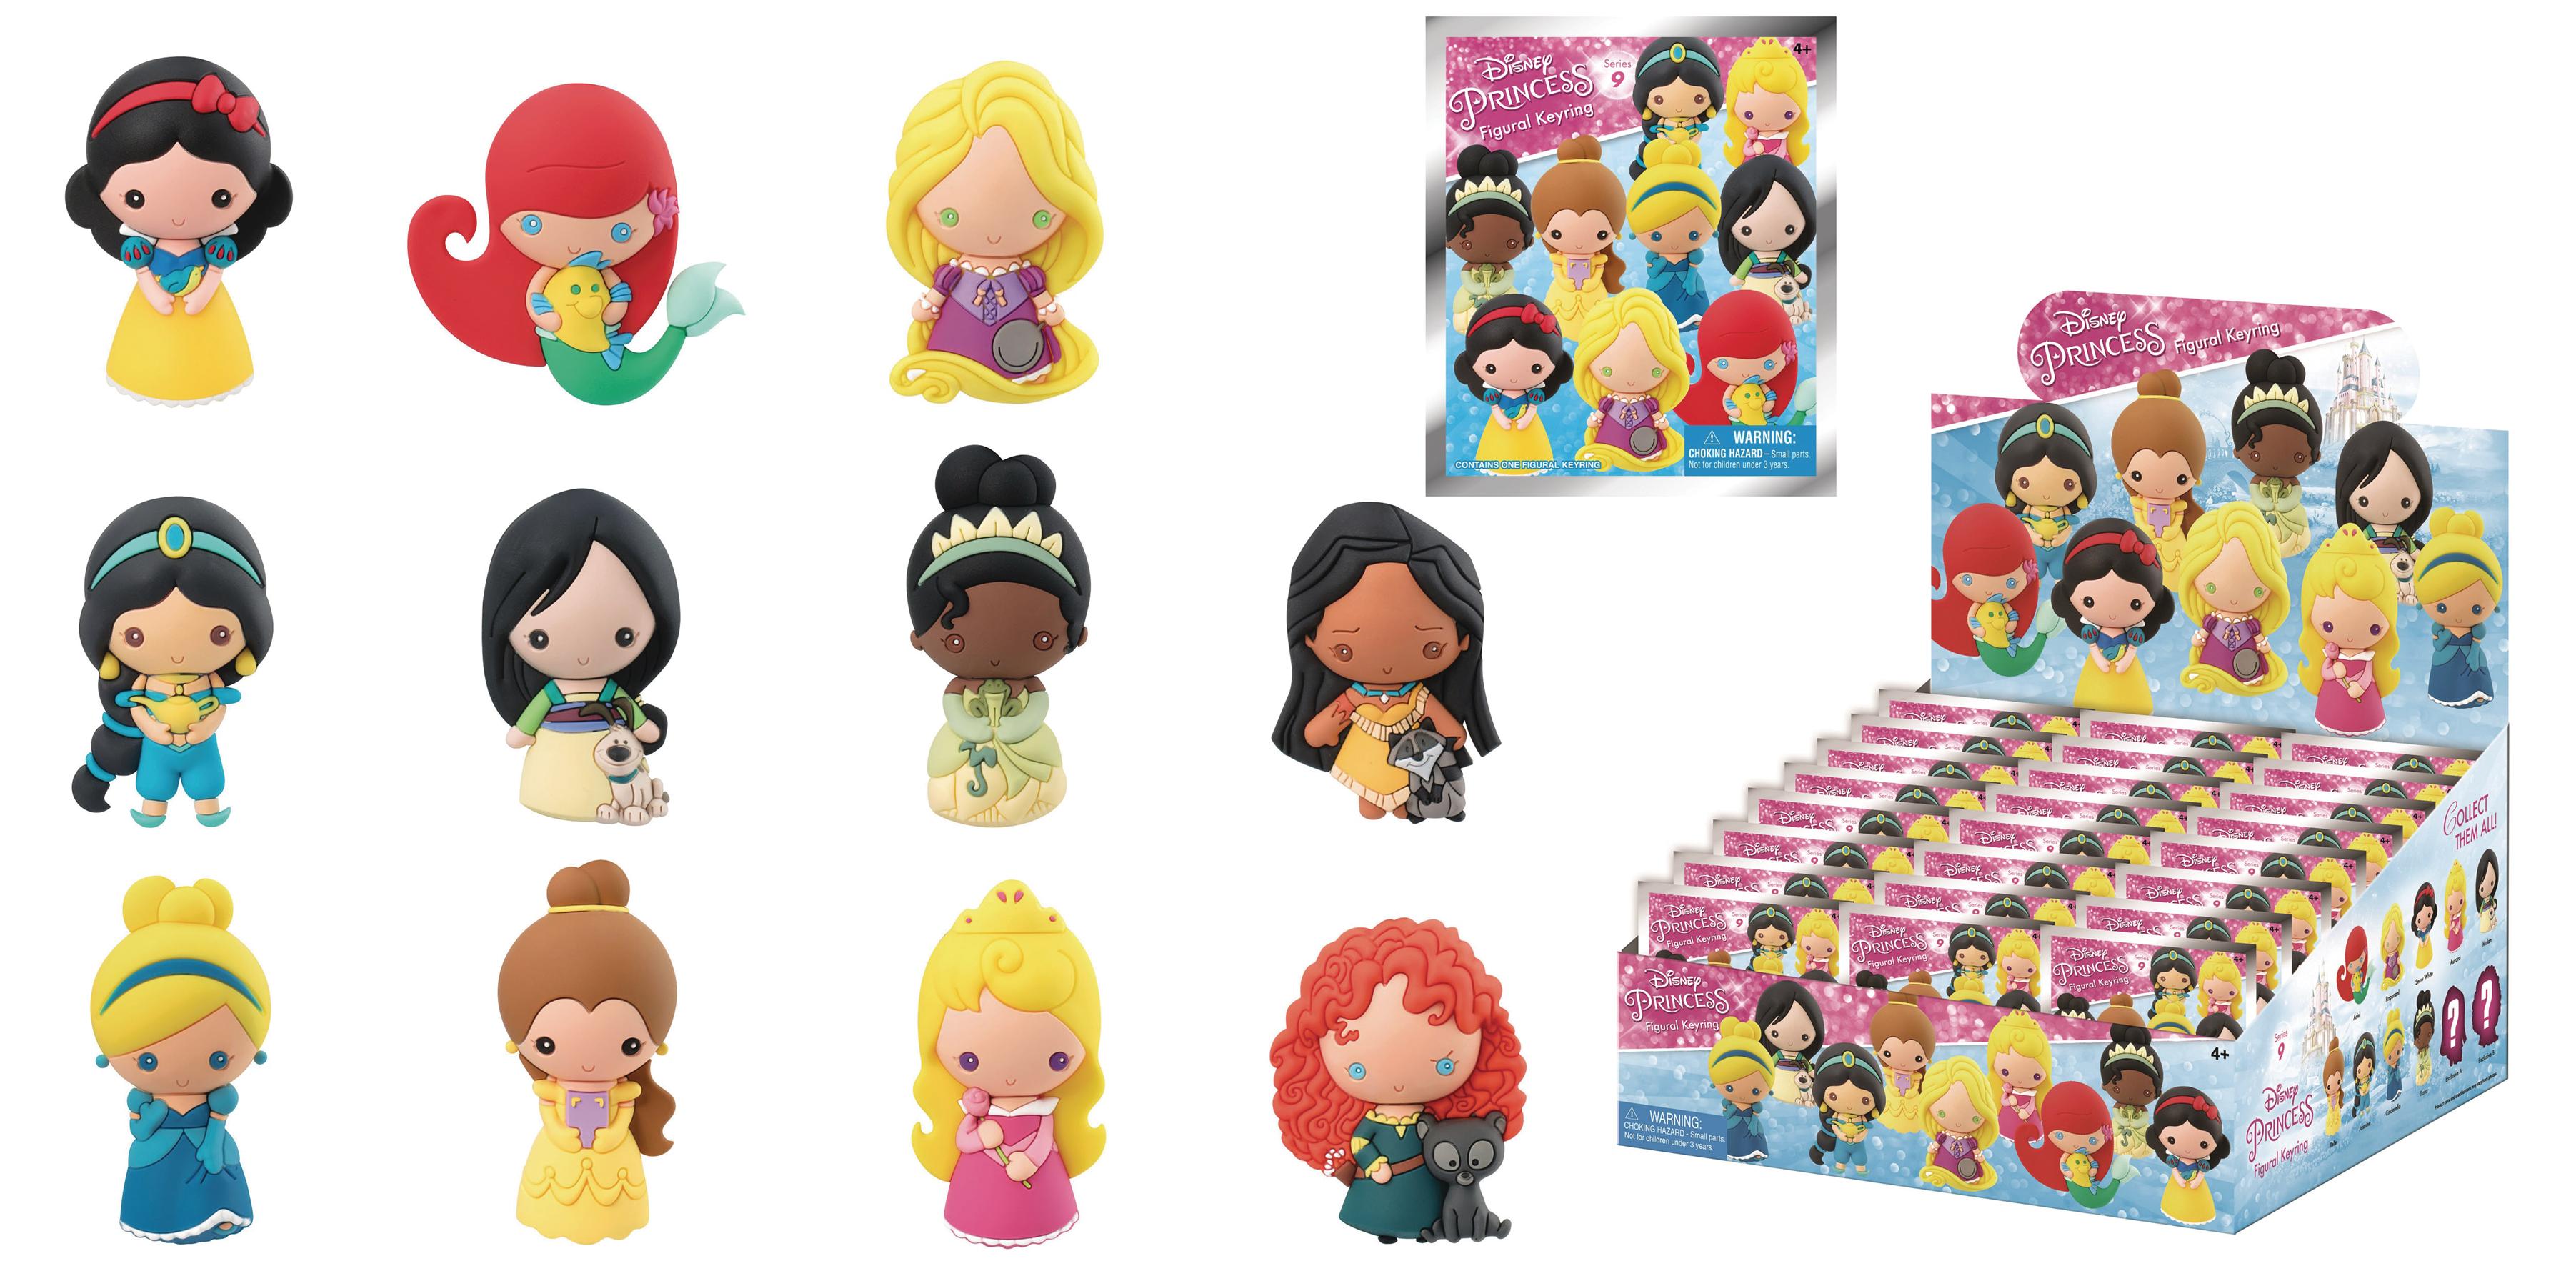 Disney Series 9 Keychain Princesses Figural Foam Blind